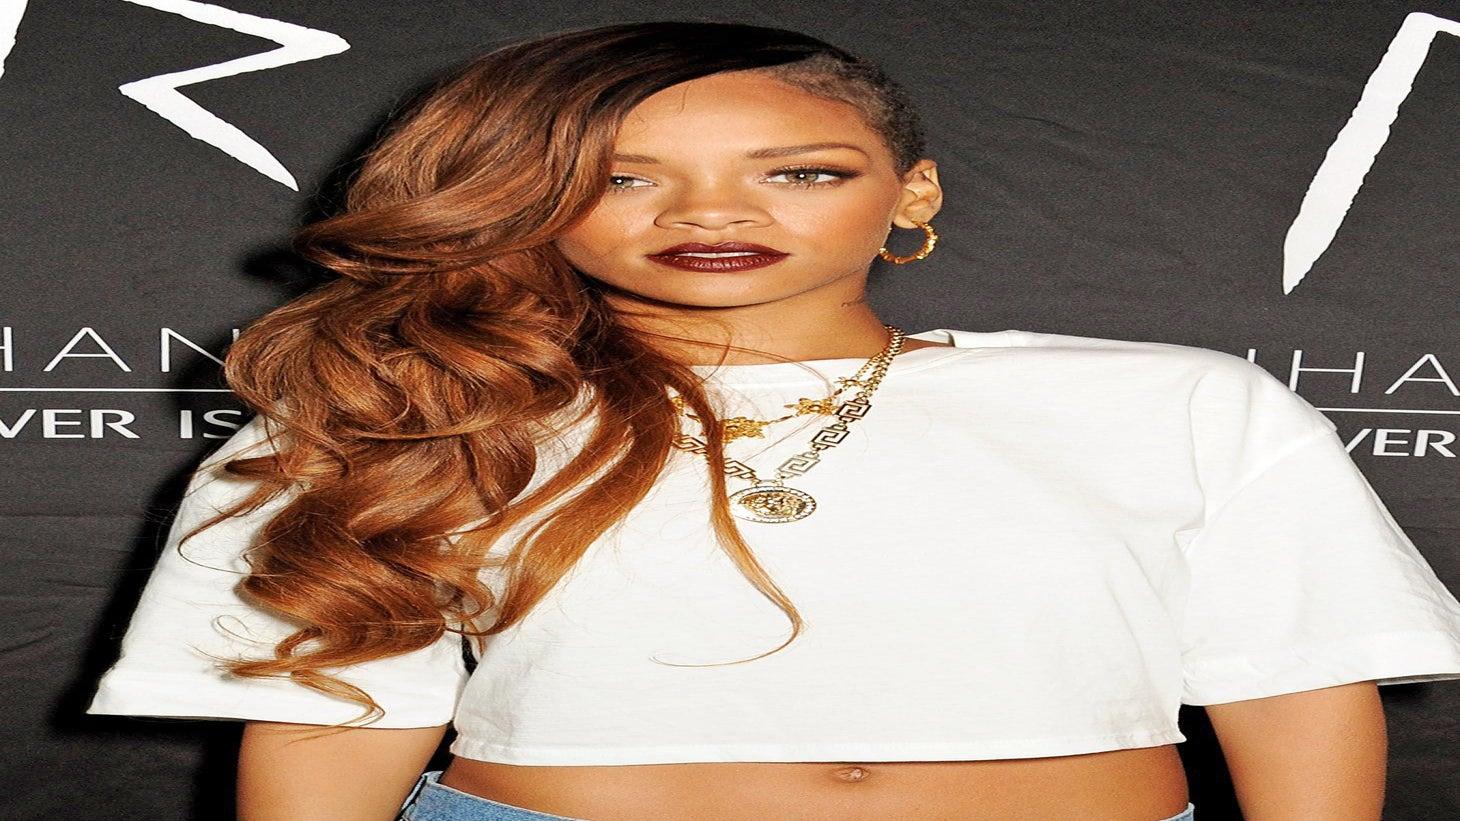 Must-See: Watch Rihanna's 'Half of Me' Documentary